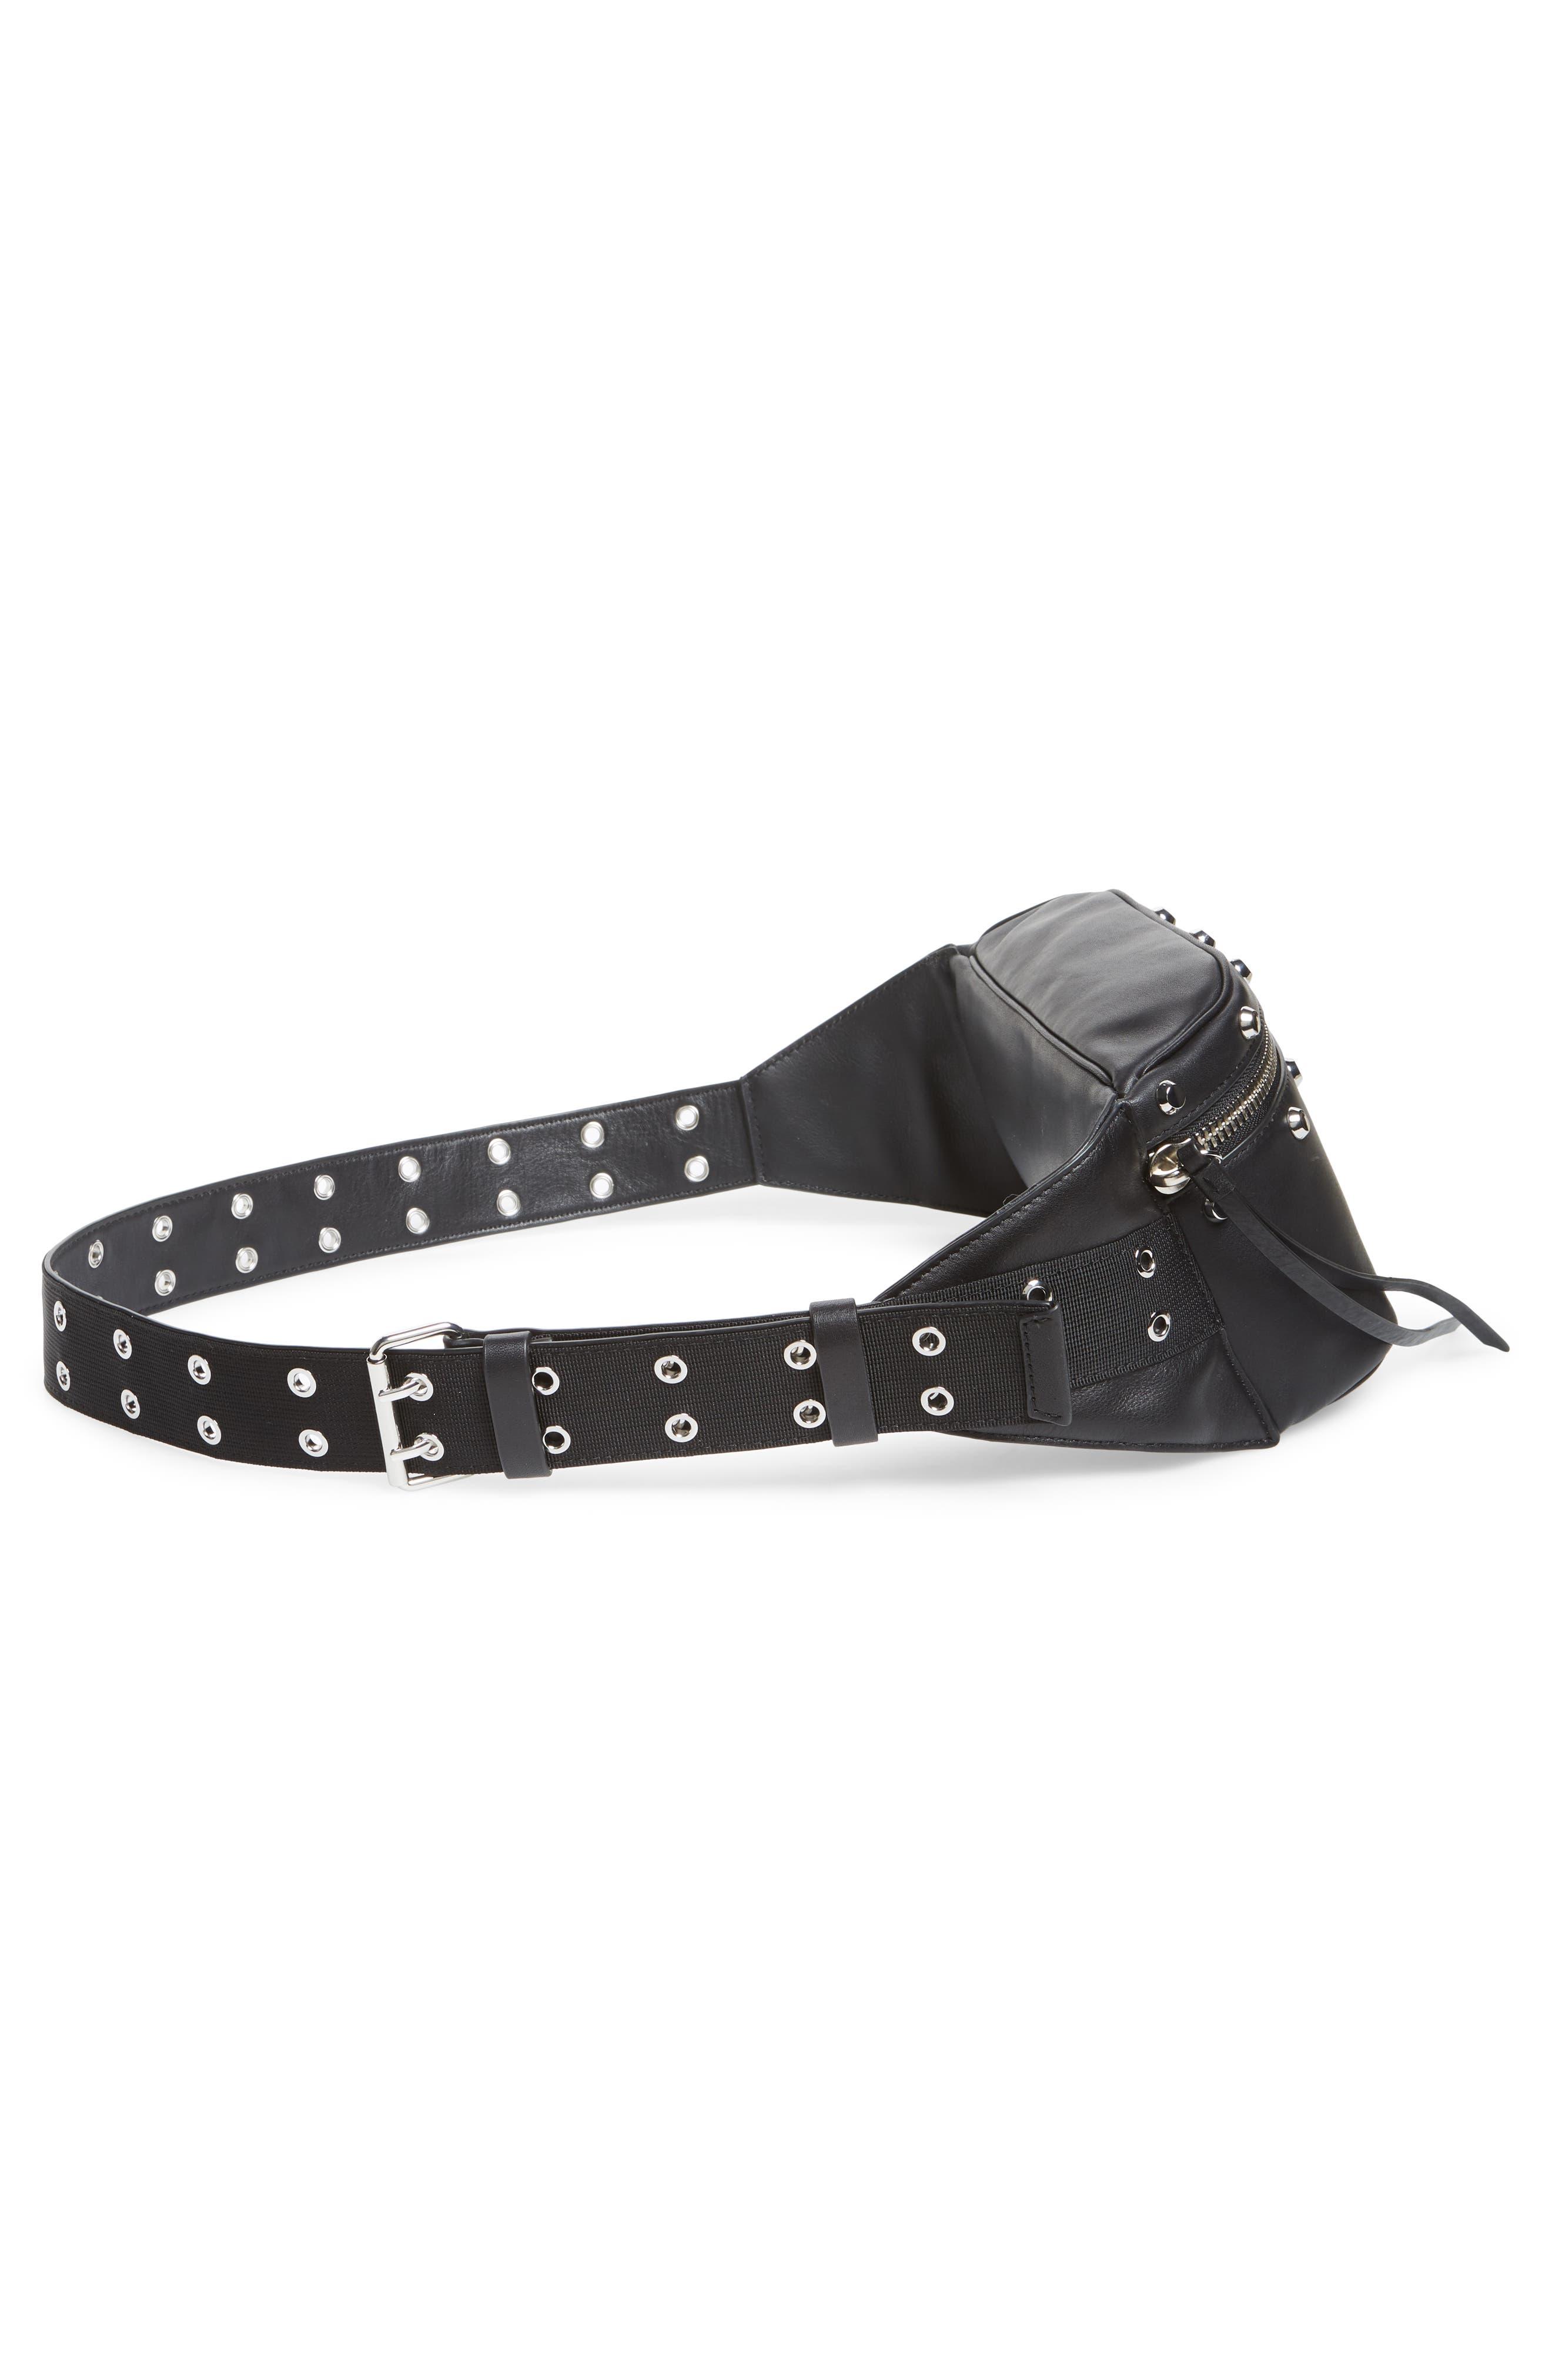 ALLSAINTS, Studded Leather Belt Bag, Alternate thumbnail 7, color, 001